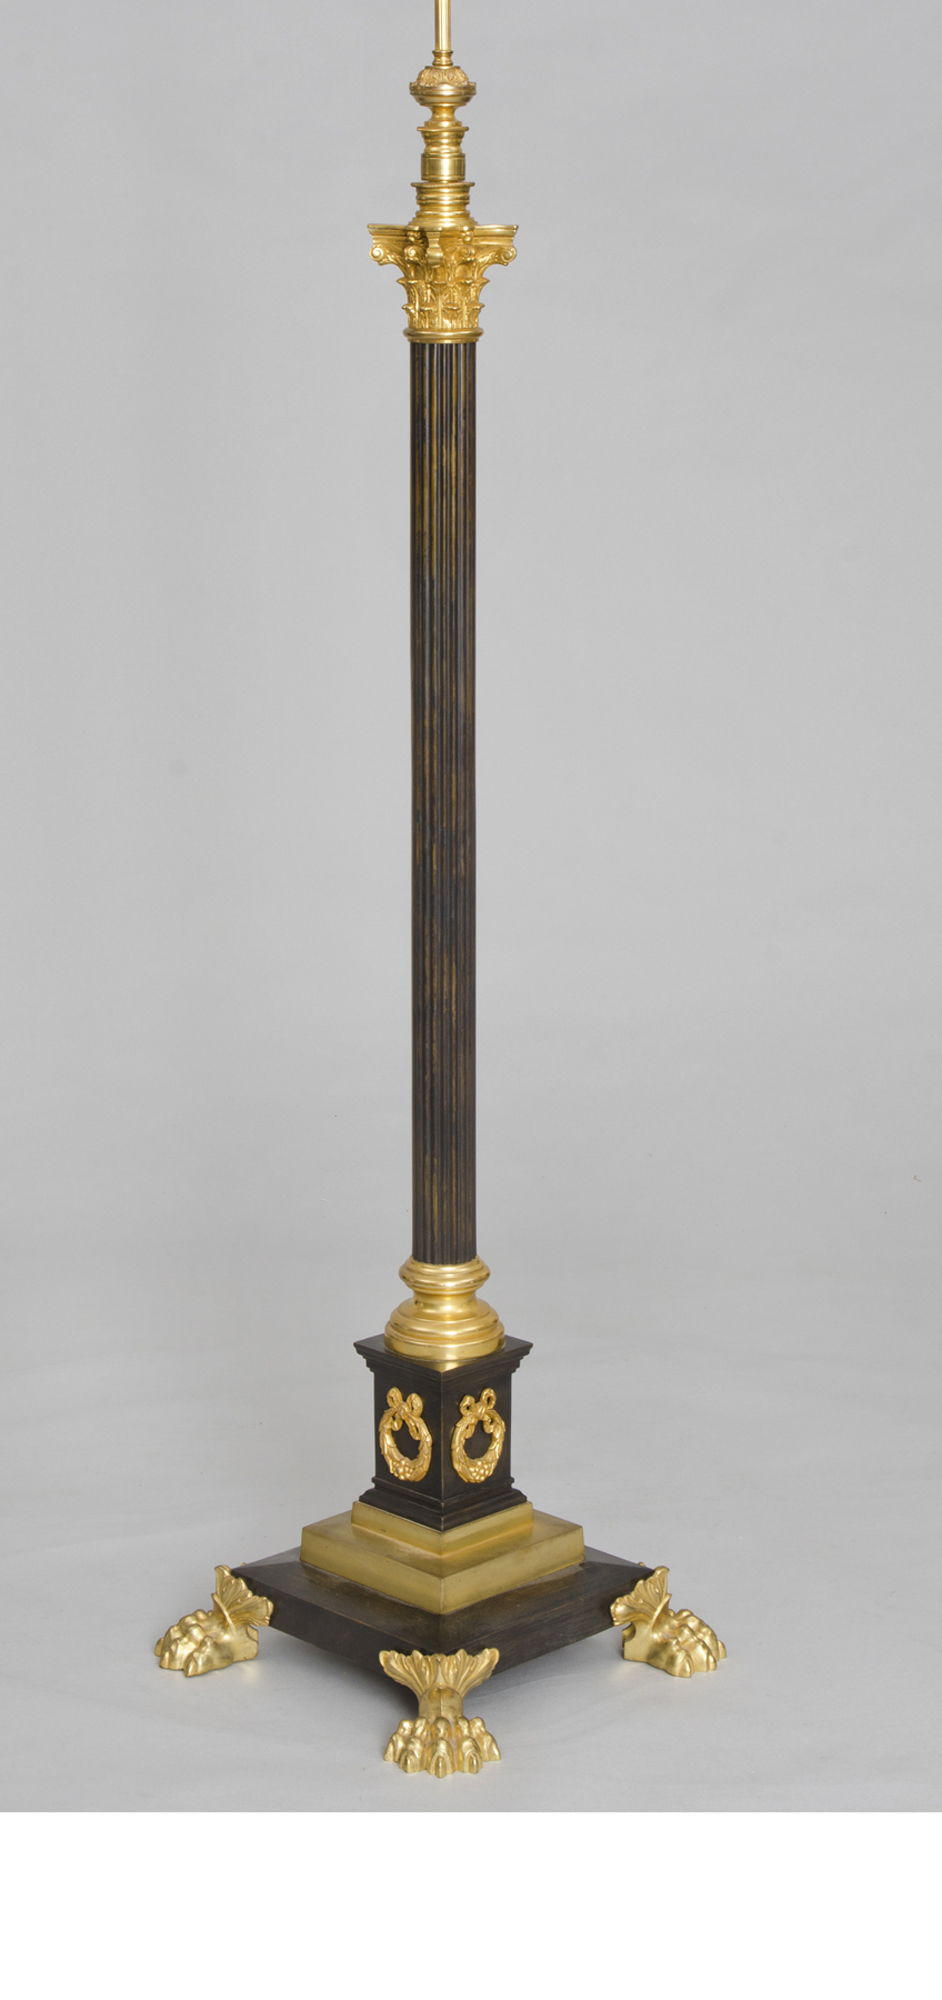 Antique Standing Lamp